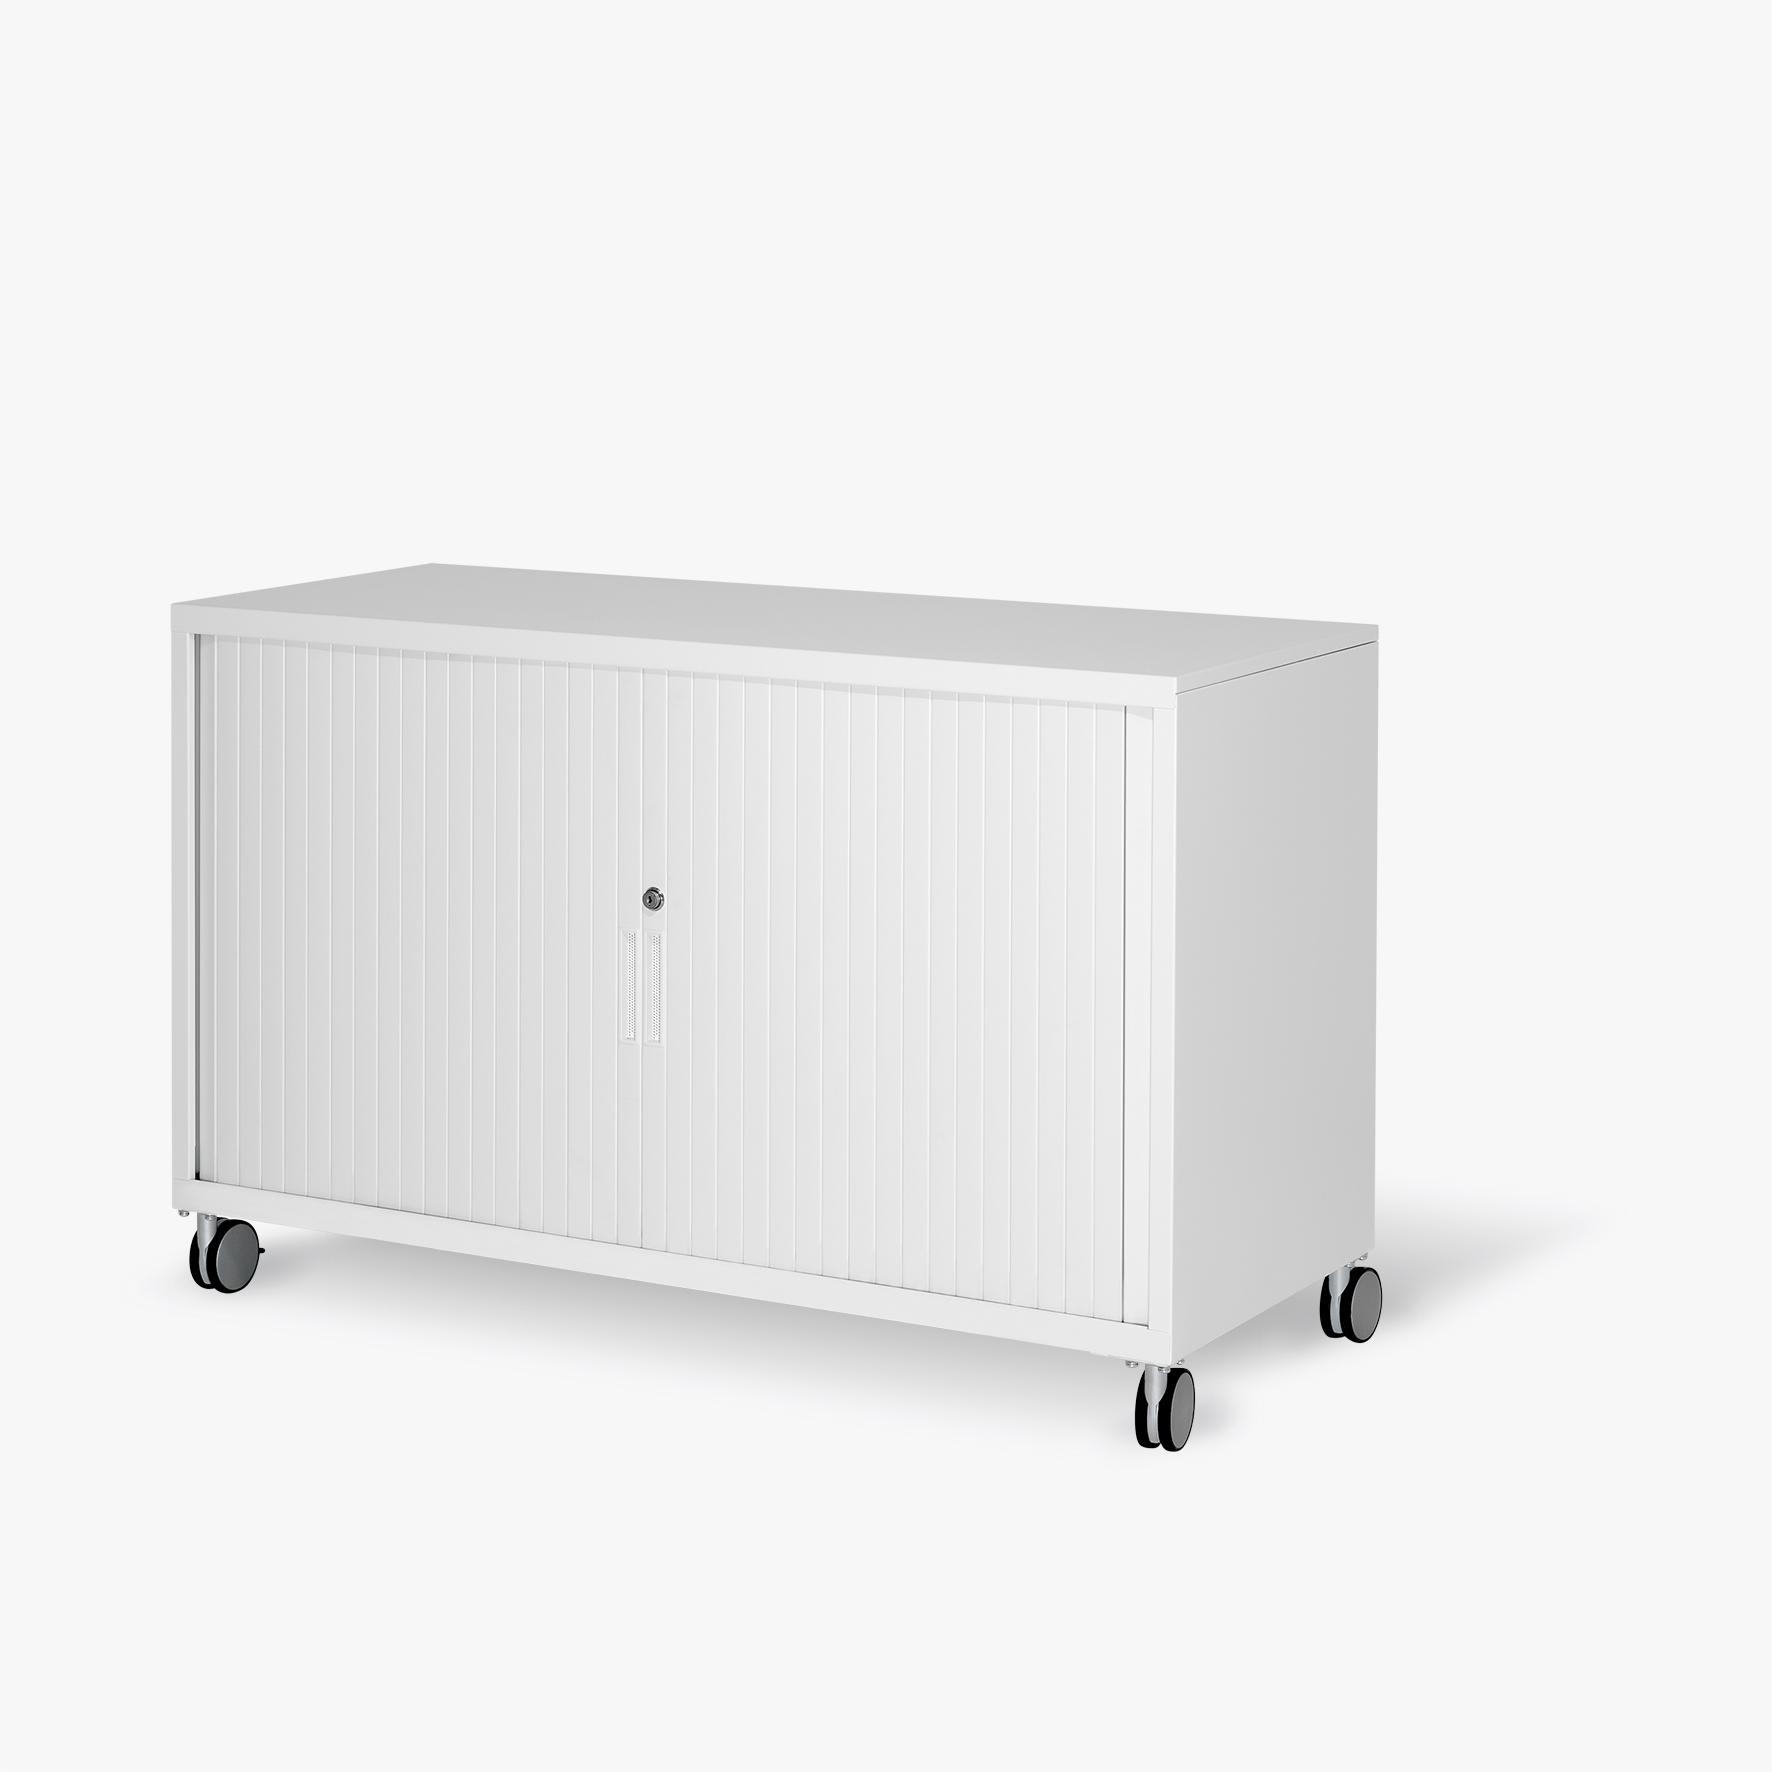 S-Series Mobile Tambour Door Cabinet by Planex